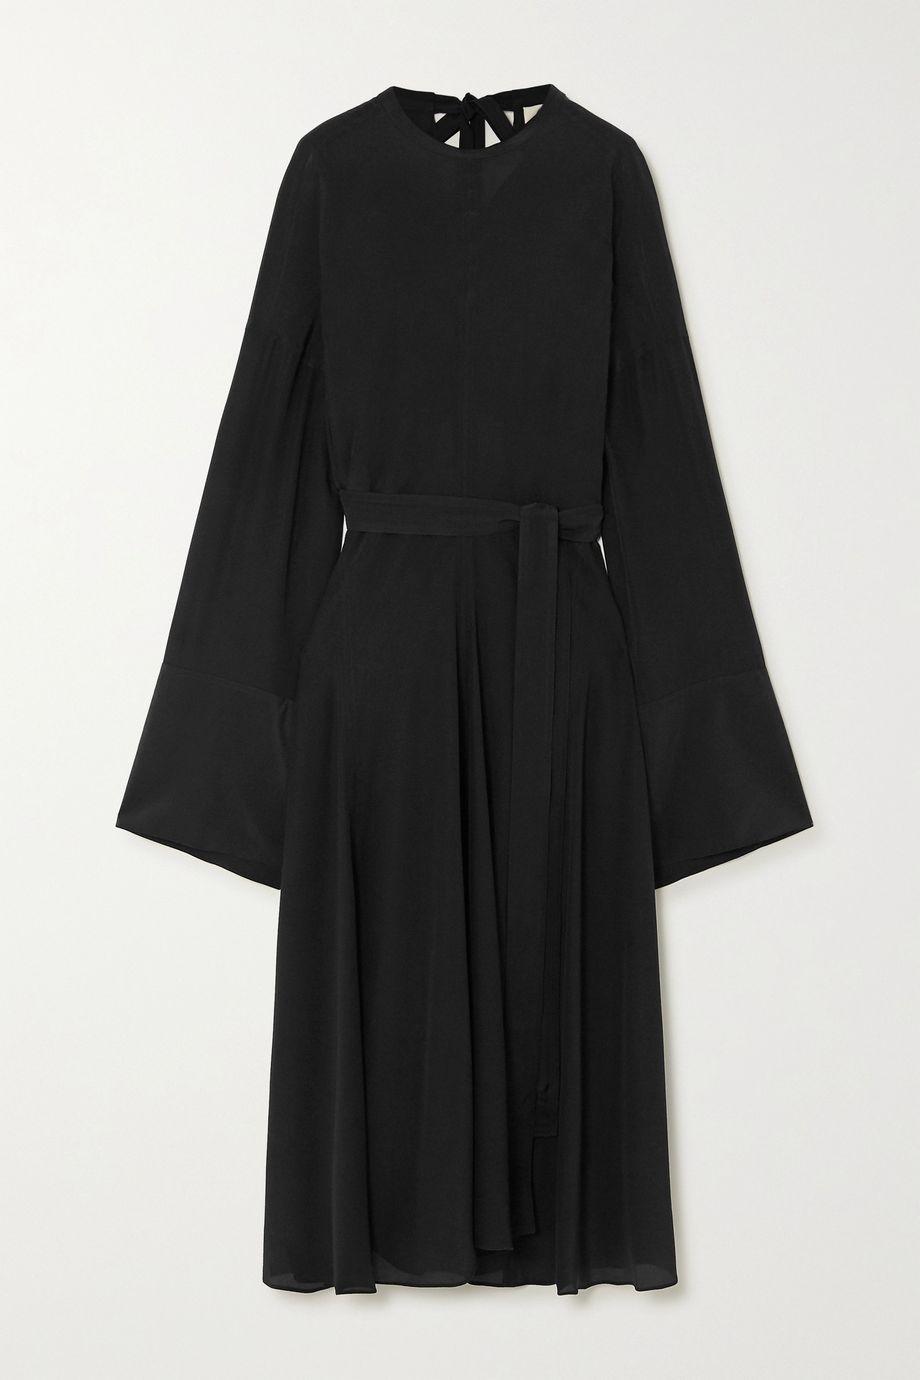 Acne Studios 挖剪缩褶真丝乔其纱超长连衣裙